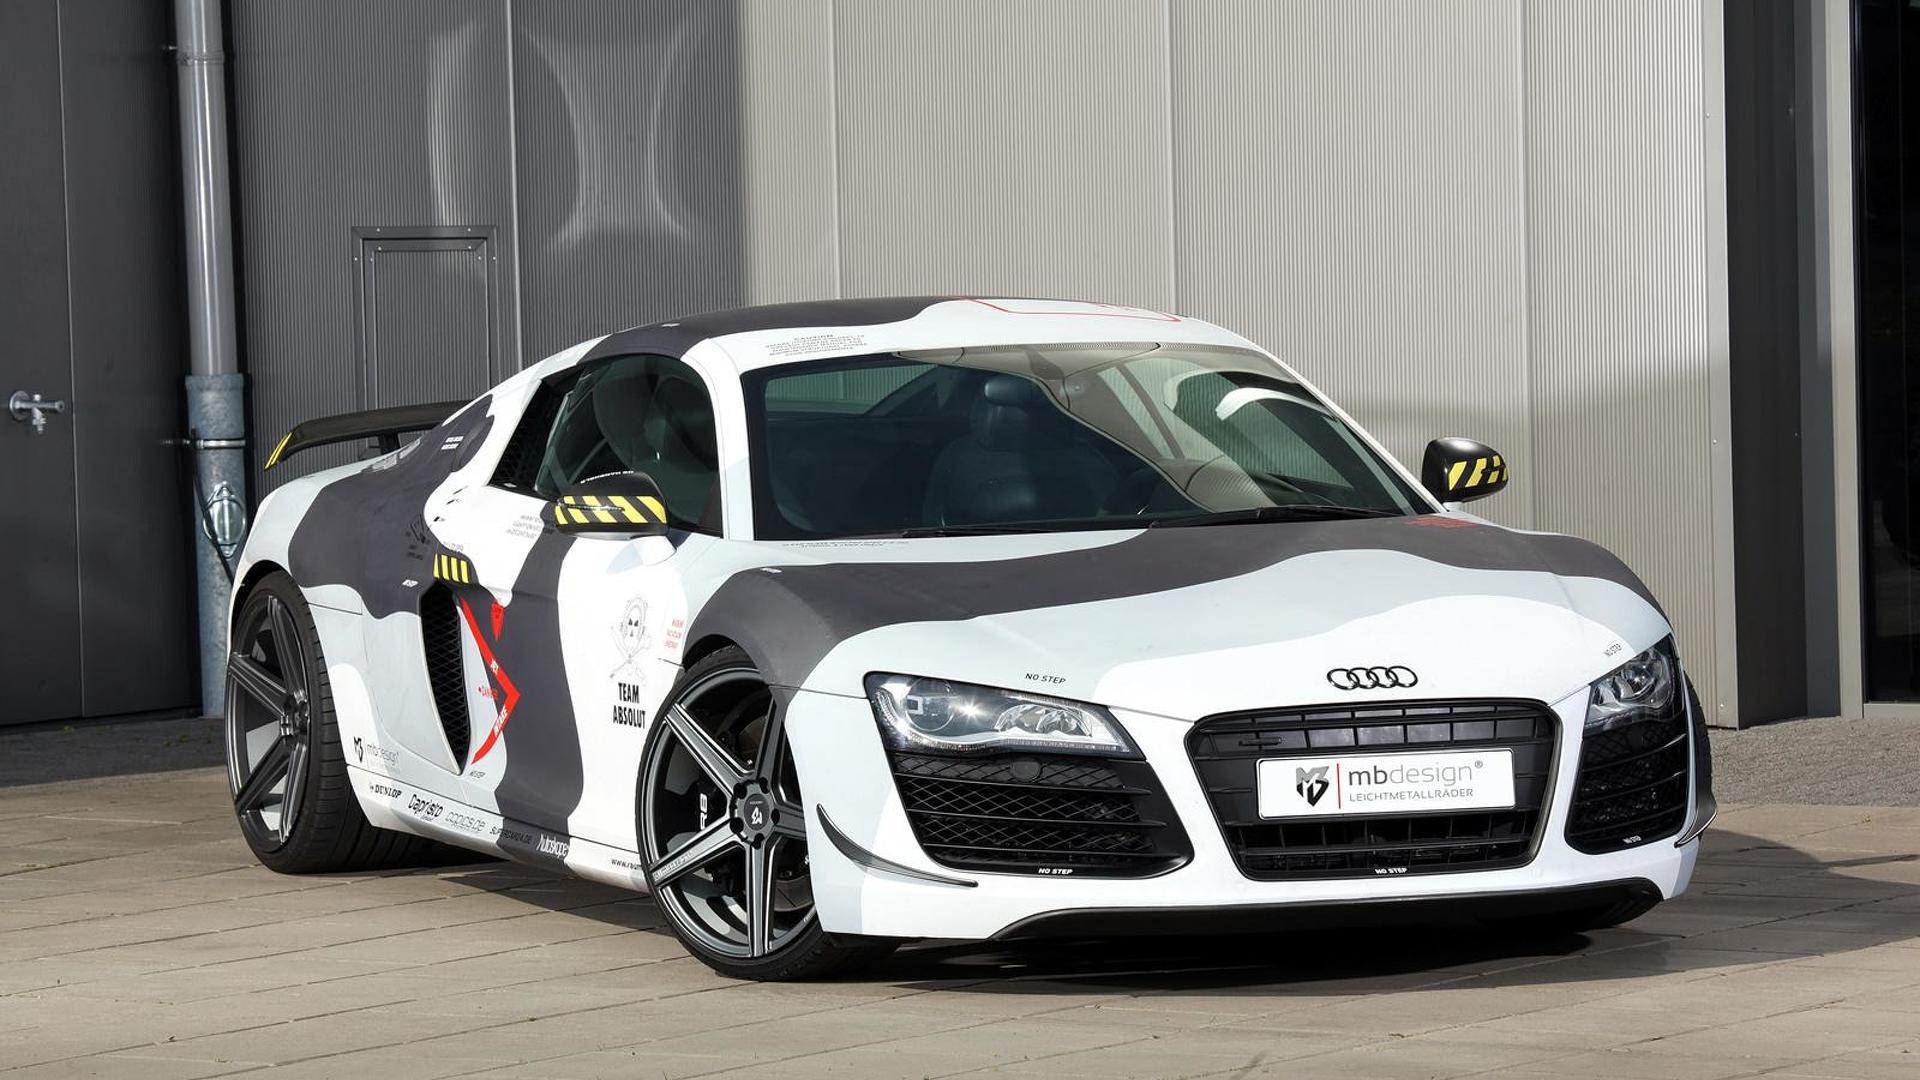 Камуфляж Audi R8 V8. Тюнинг от mbDESIGN